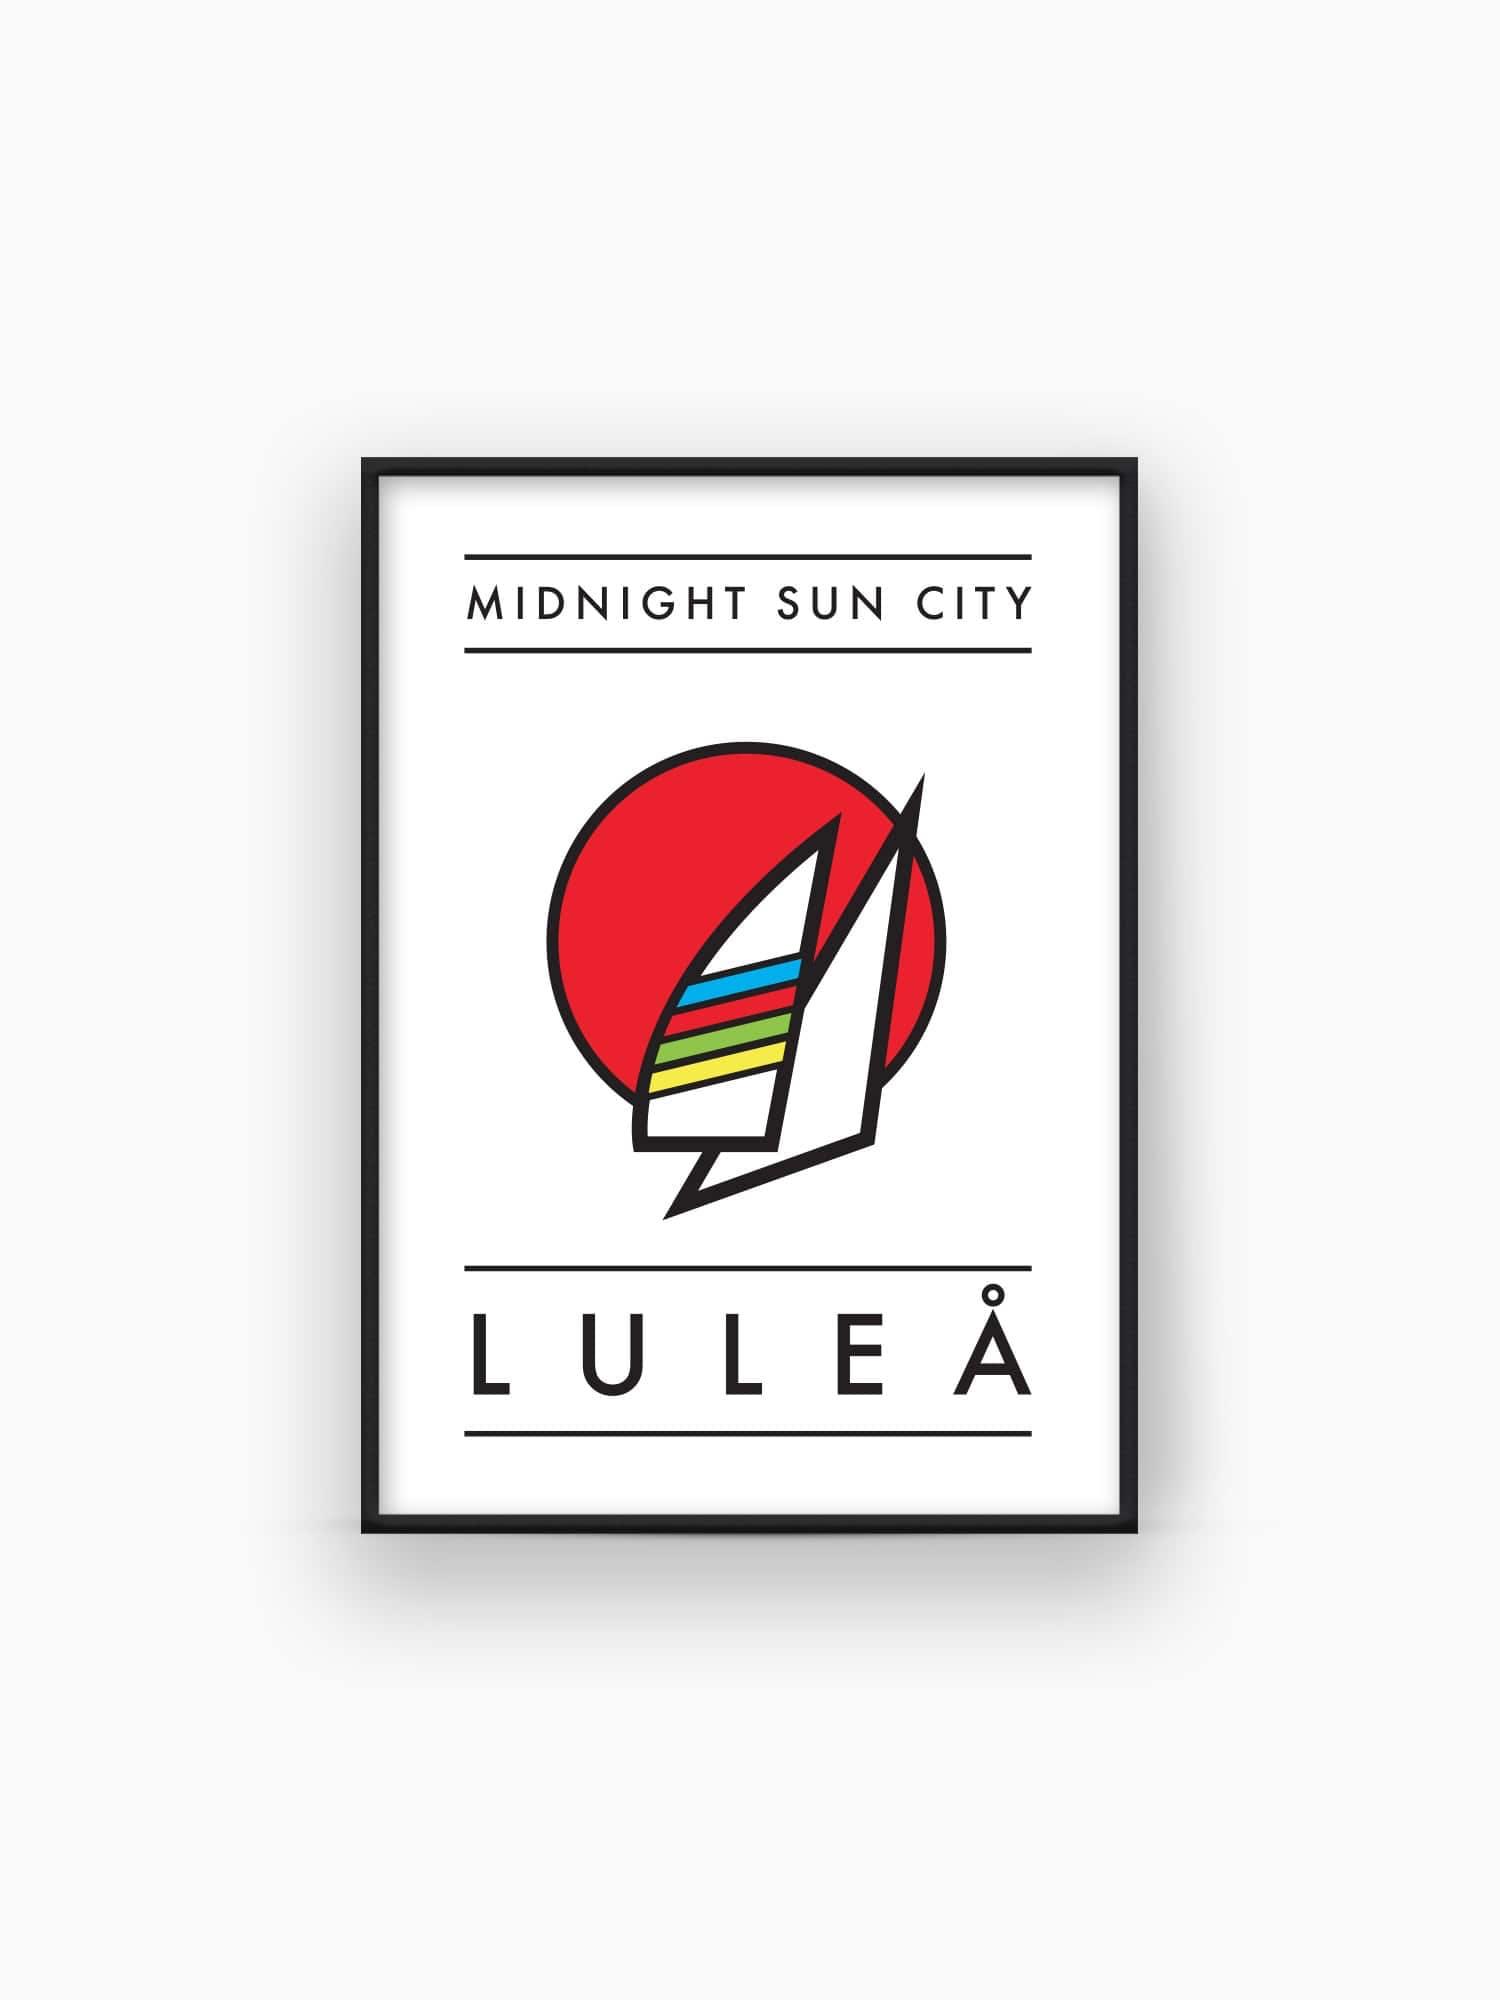 Midnight sun city Luleå - Burban Studios